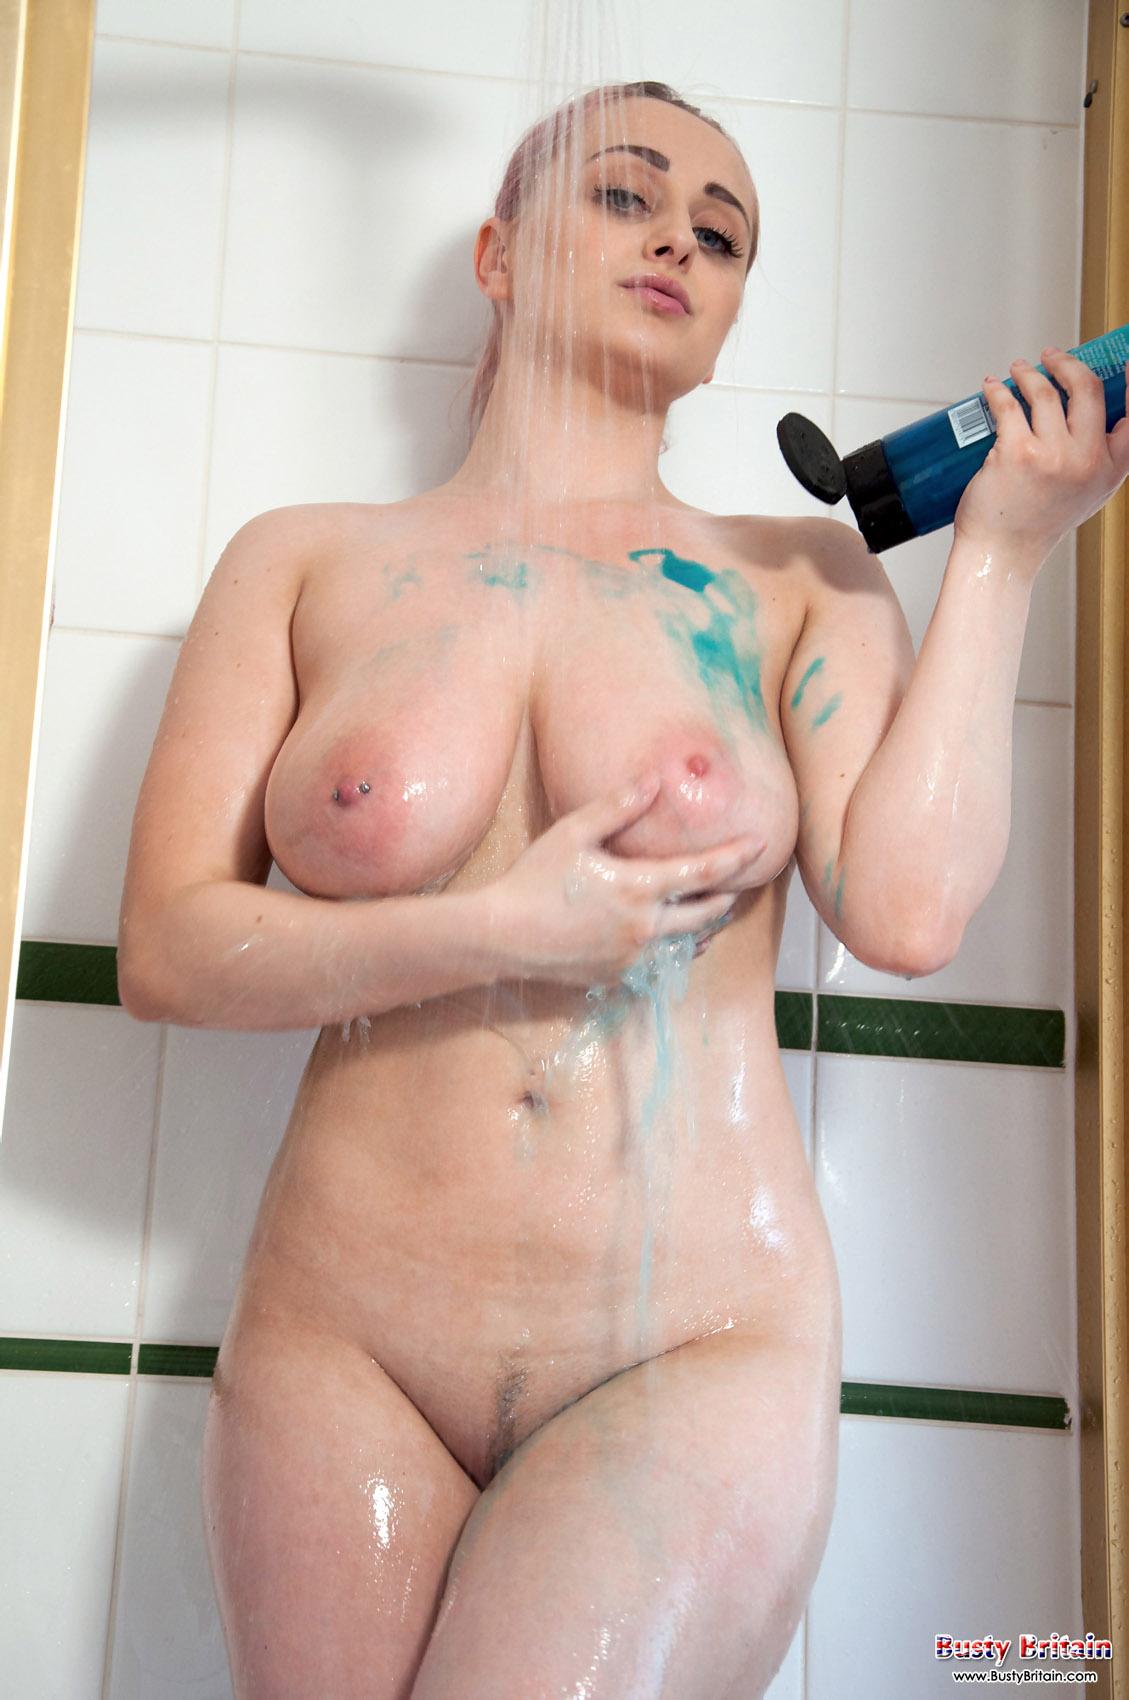 Authoritative message Nude shower accept